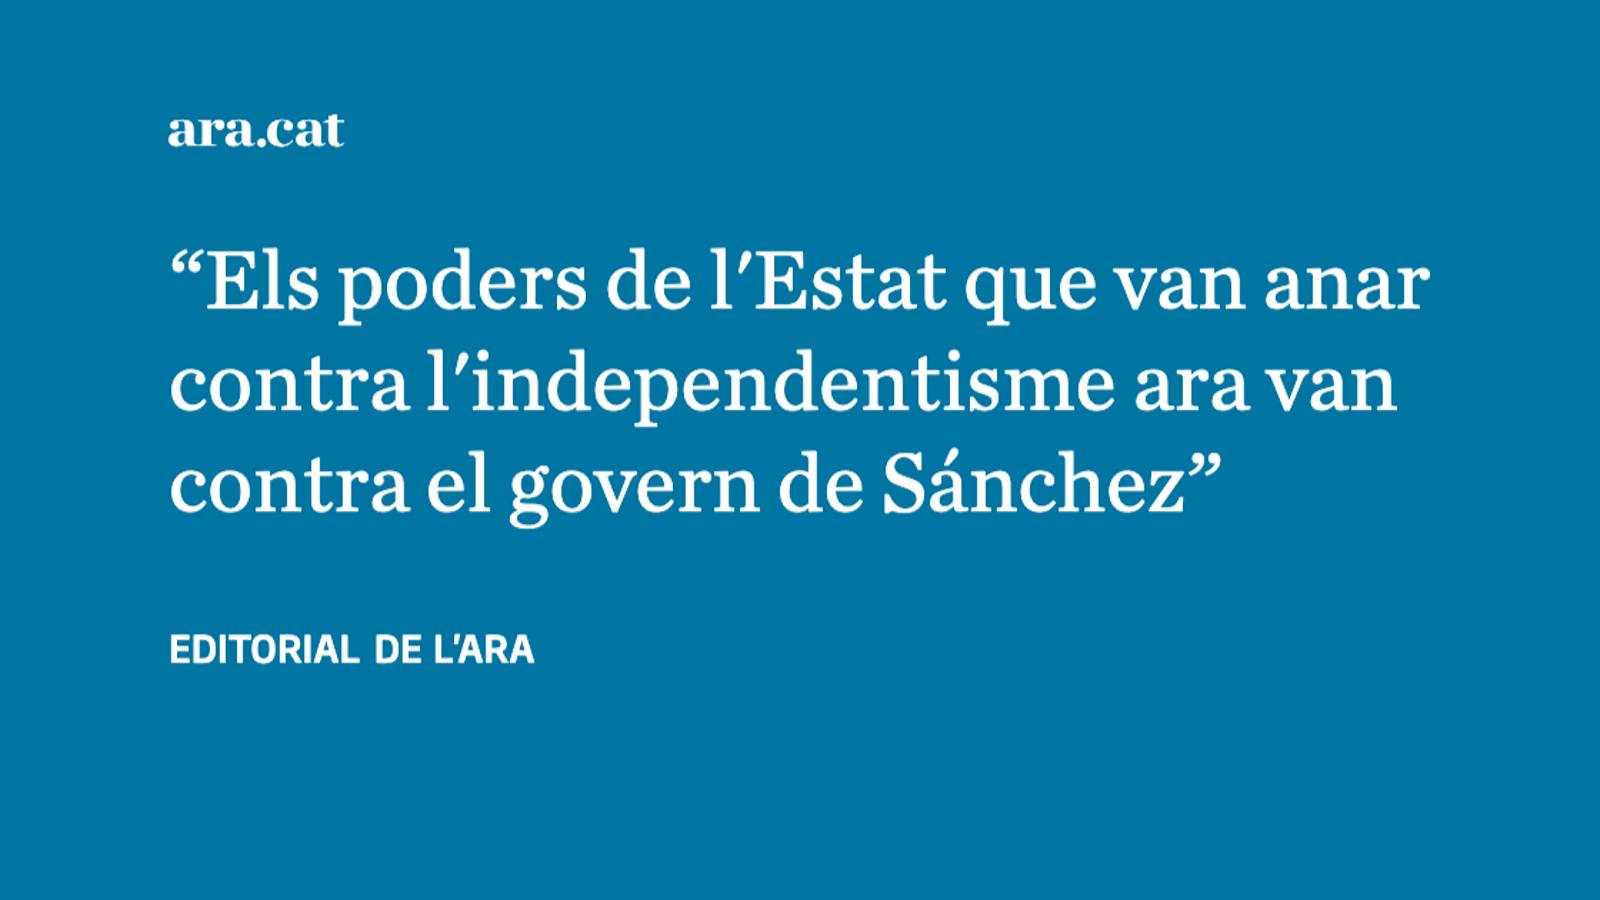 El govern espanyol topa amb el 'deep state'